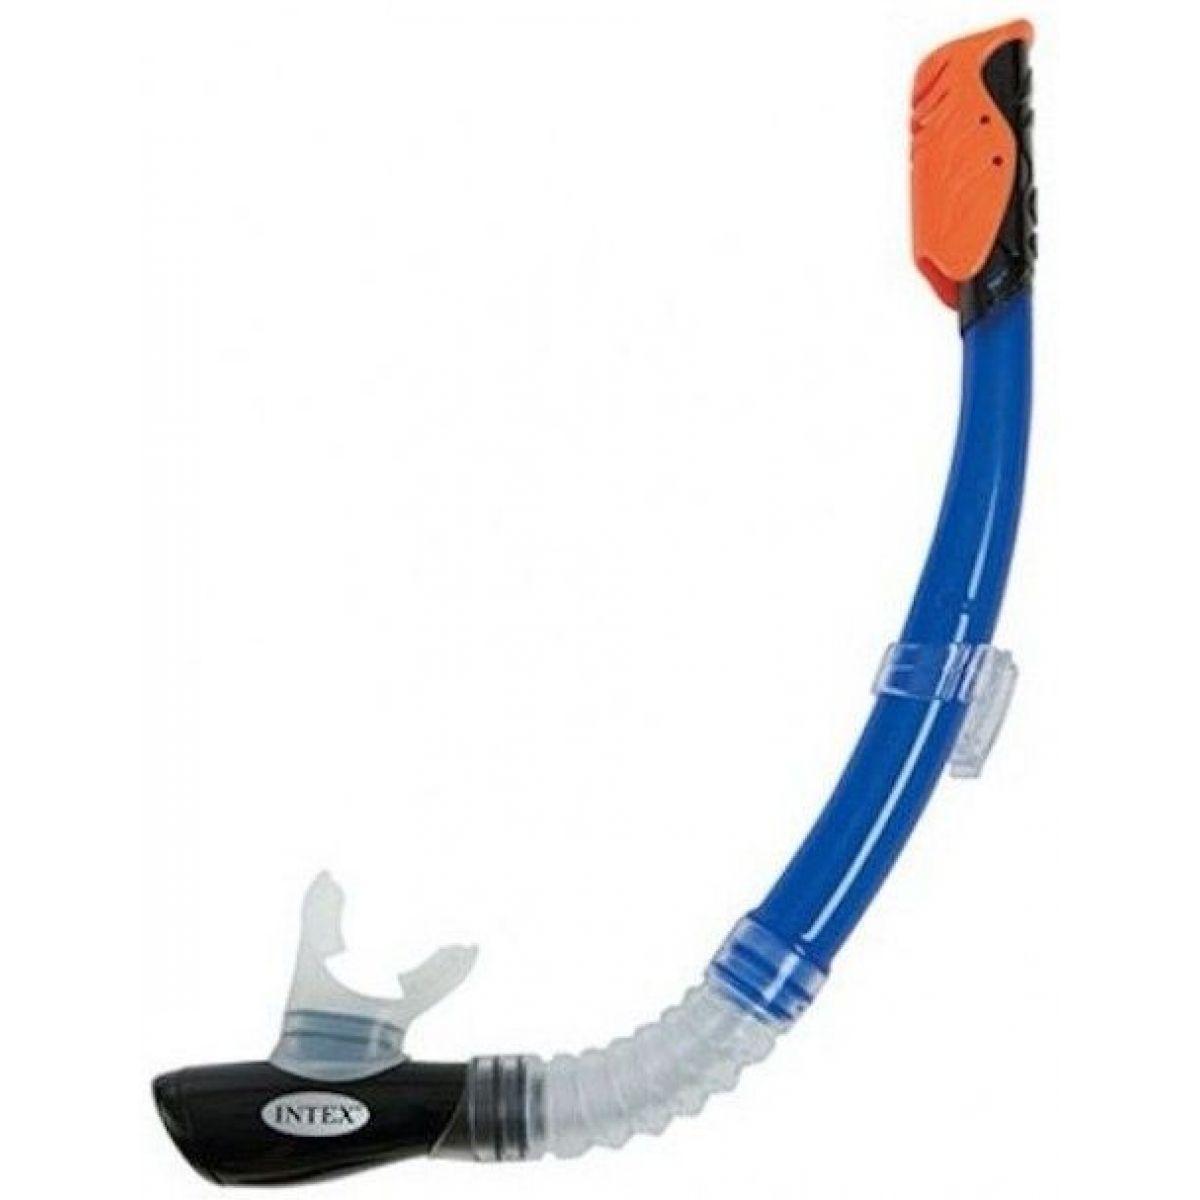 Intex 55924 Šnorchl Hyper-Flo 8+ modrý